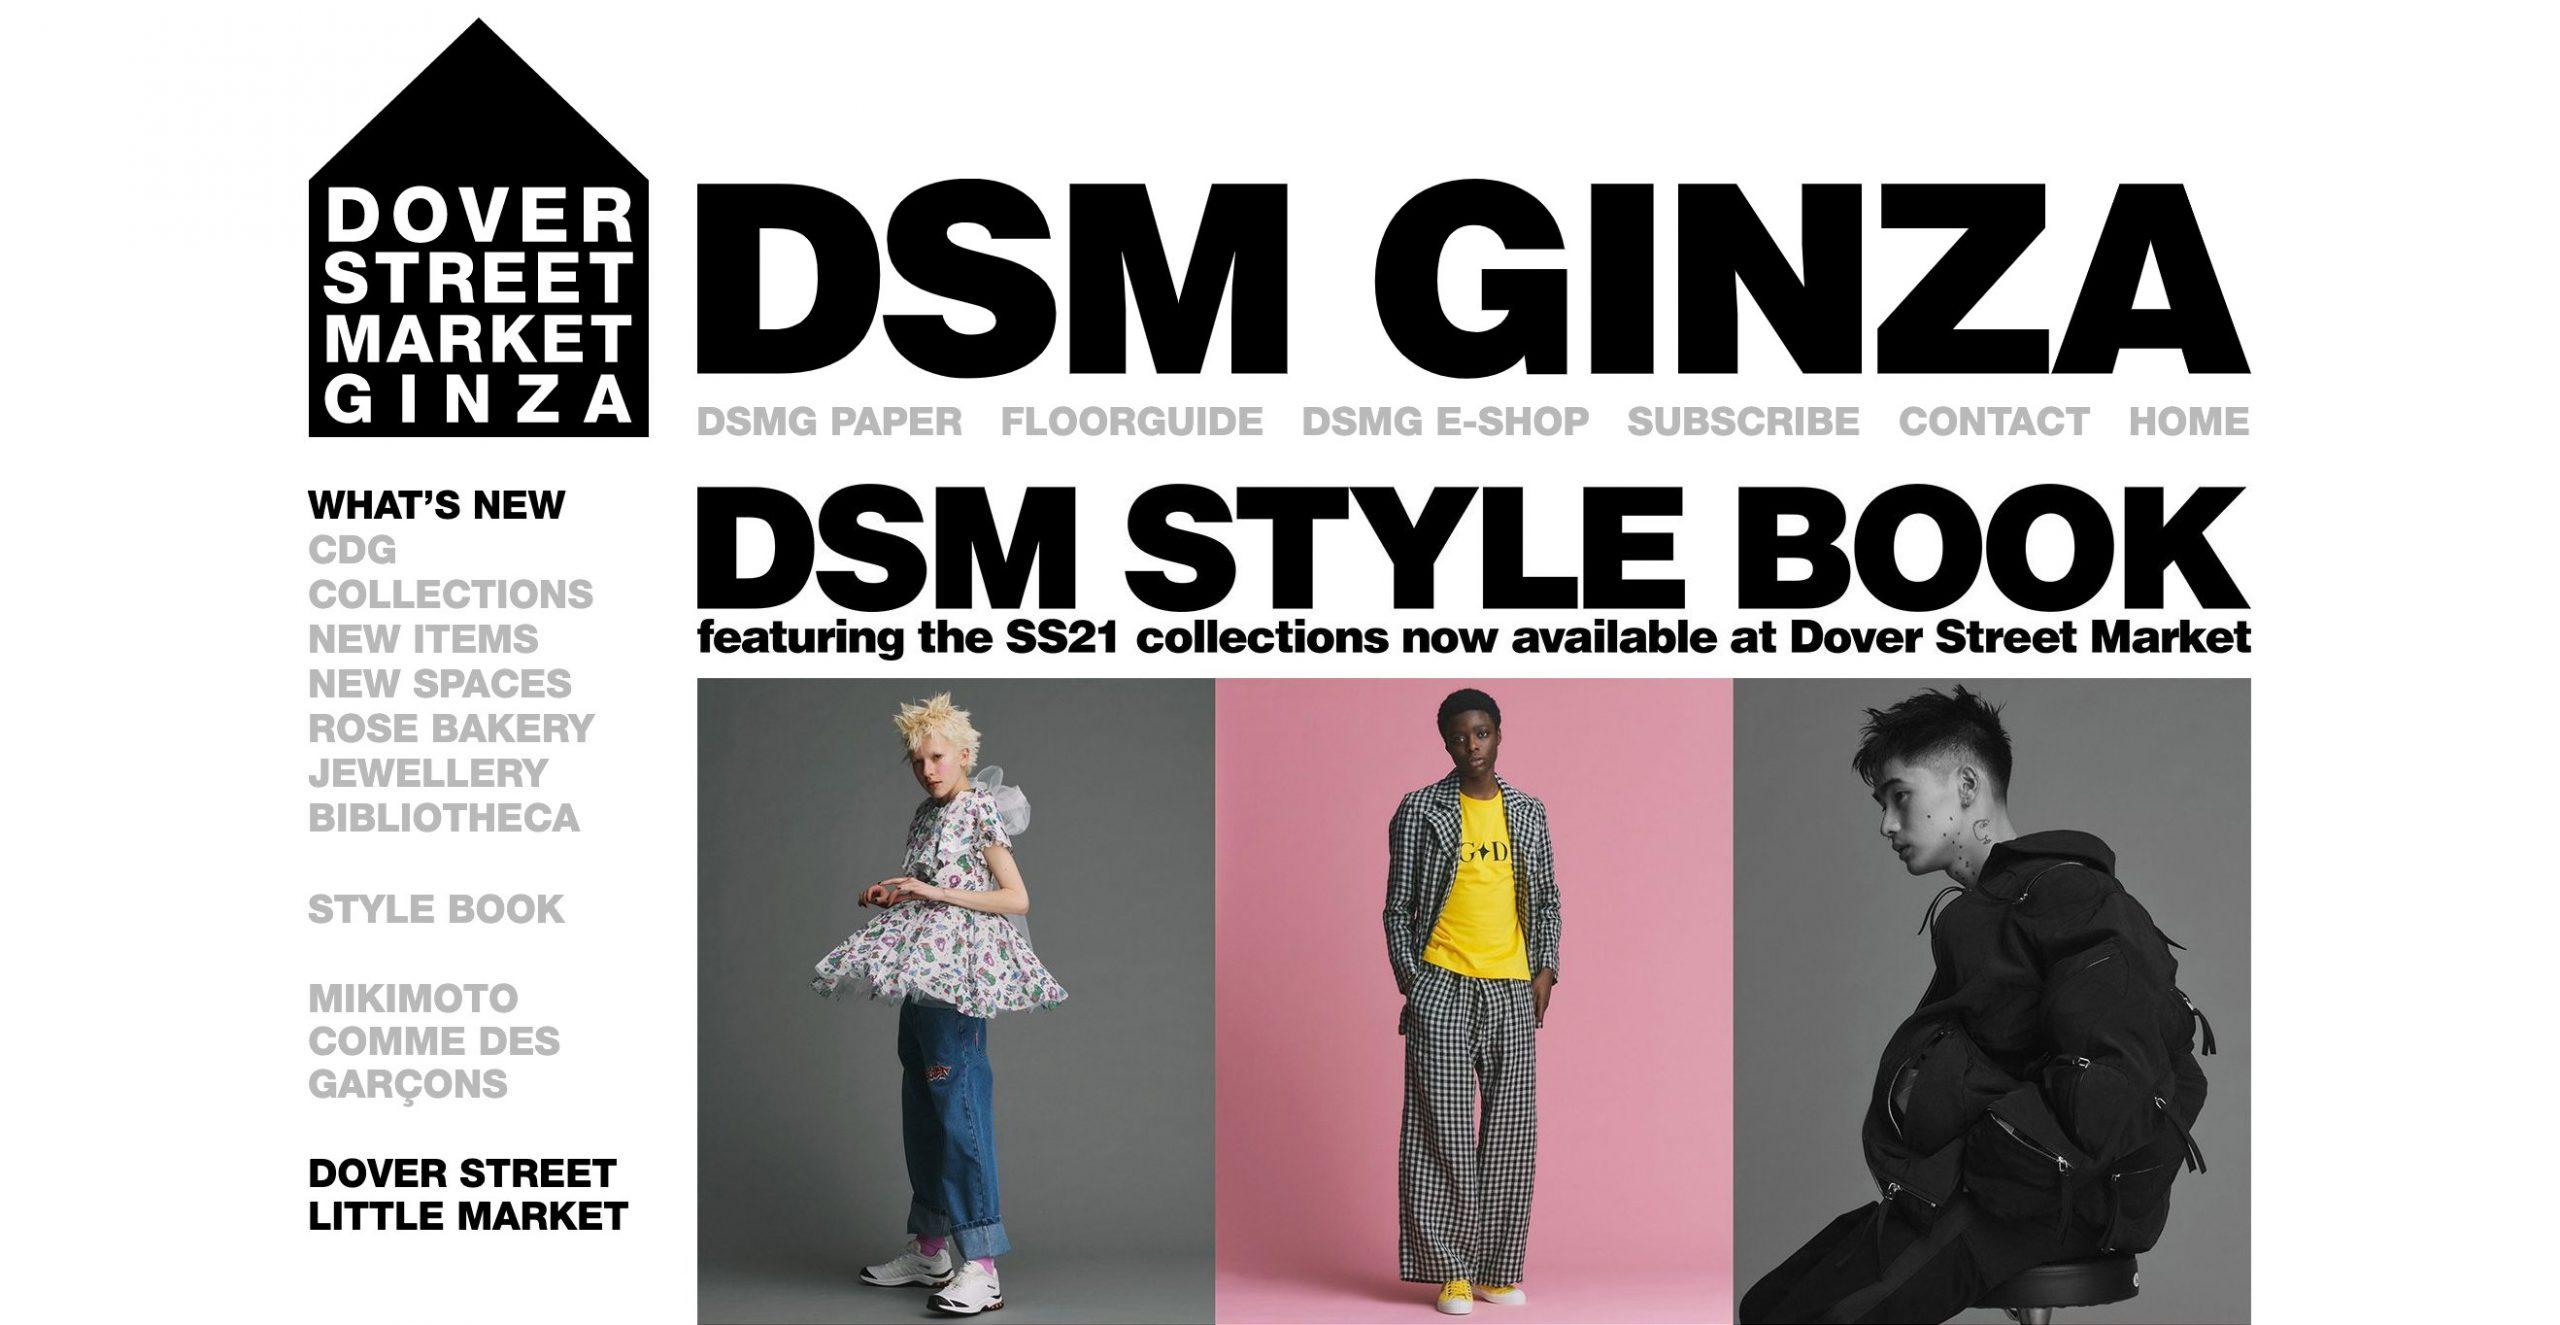 Dover Street Market 日本 網購 DSMG 潮流服飾